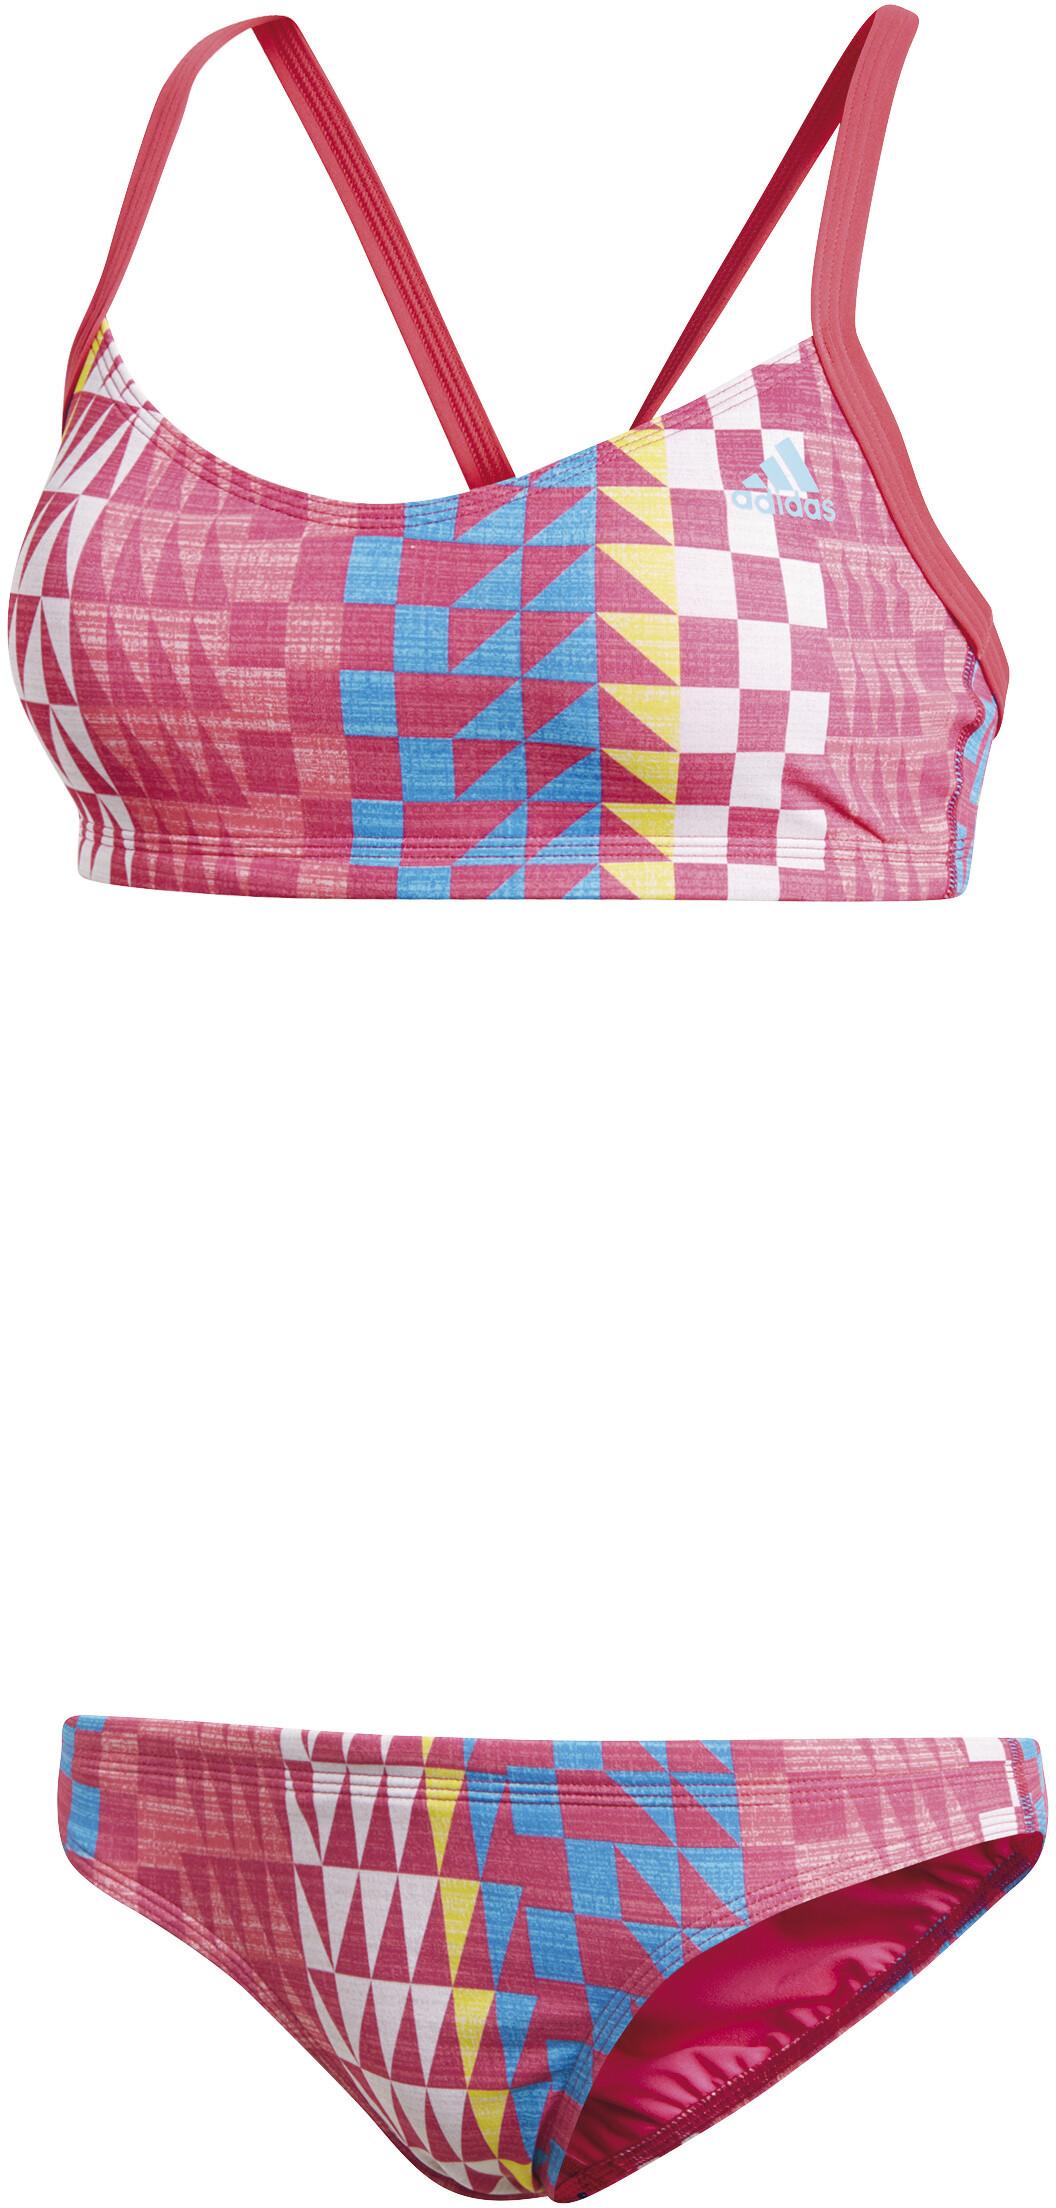 ff4b1410ccb adidas Allover Print bikini Dames roze/blauw l Online outdoor shop ...